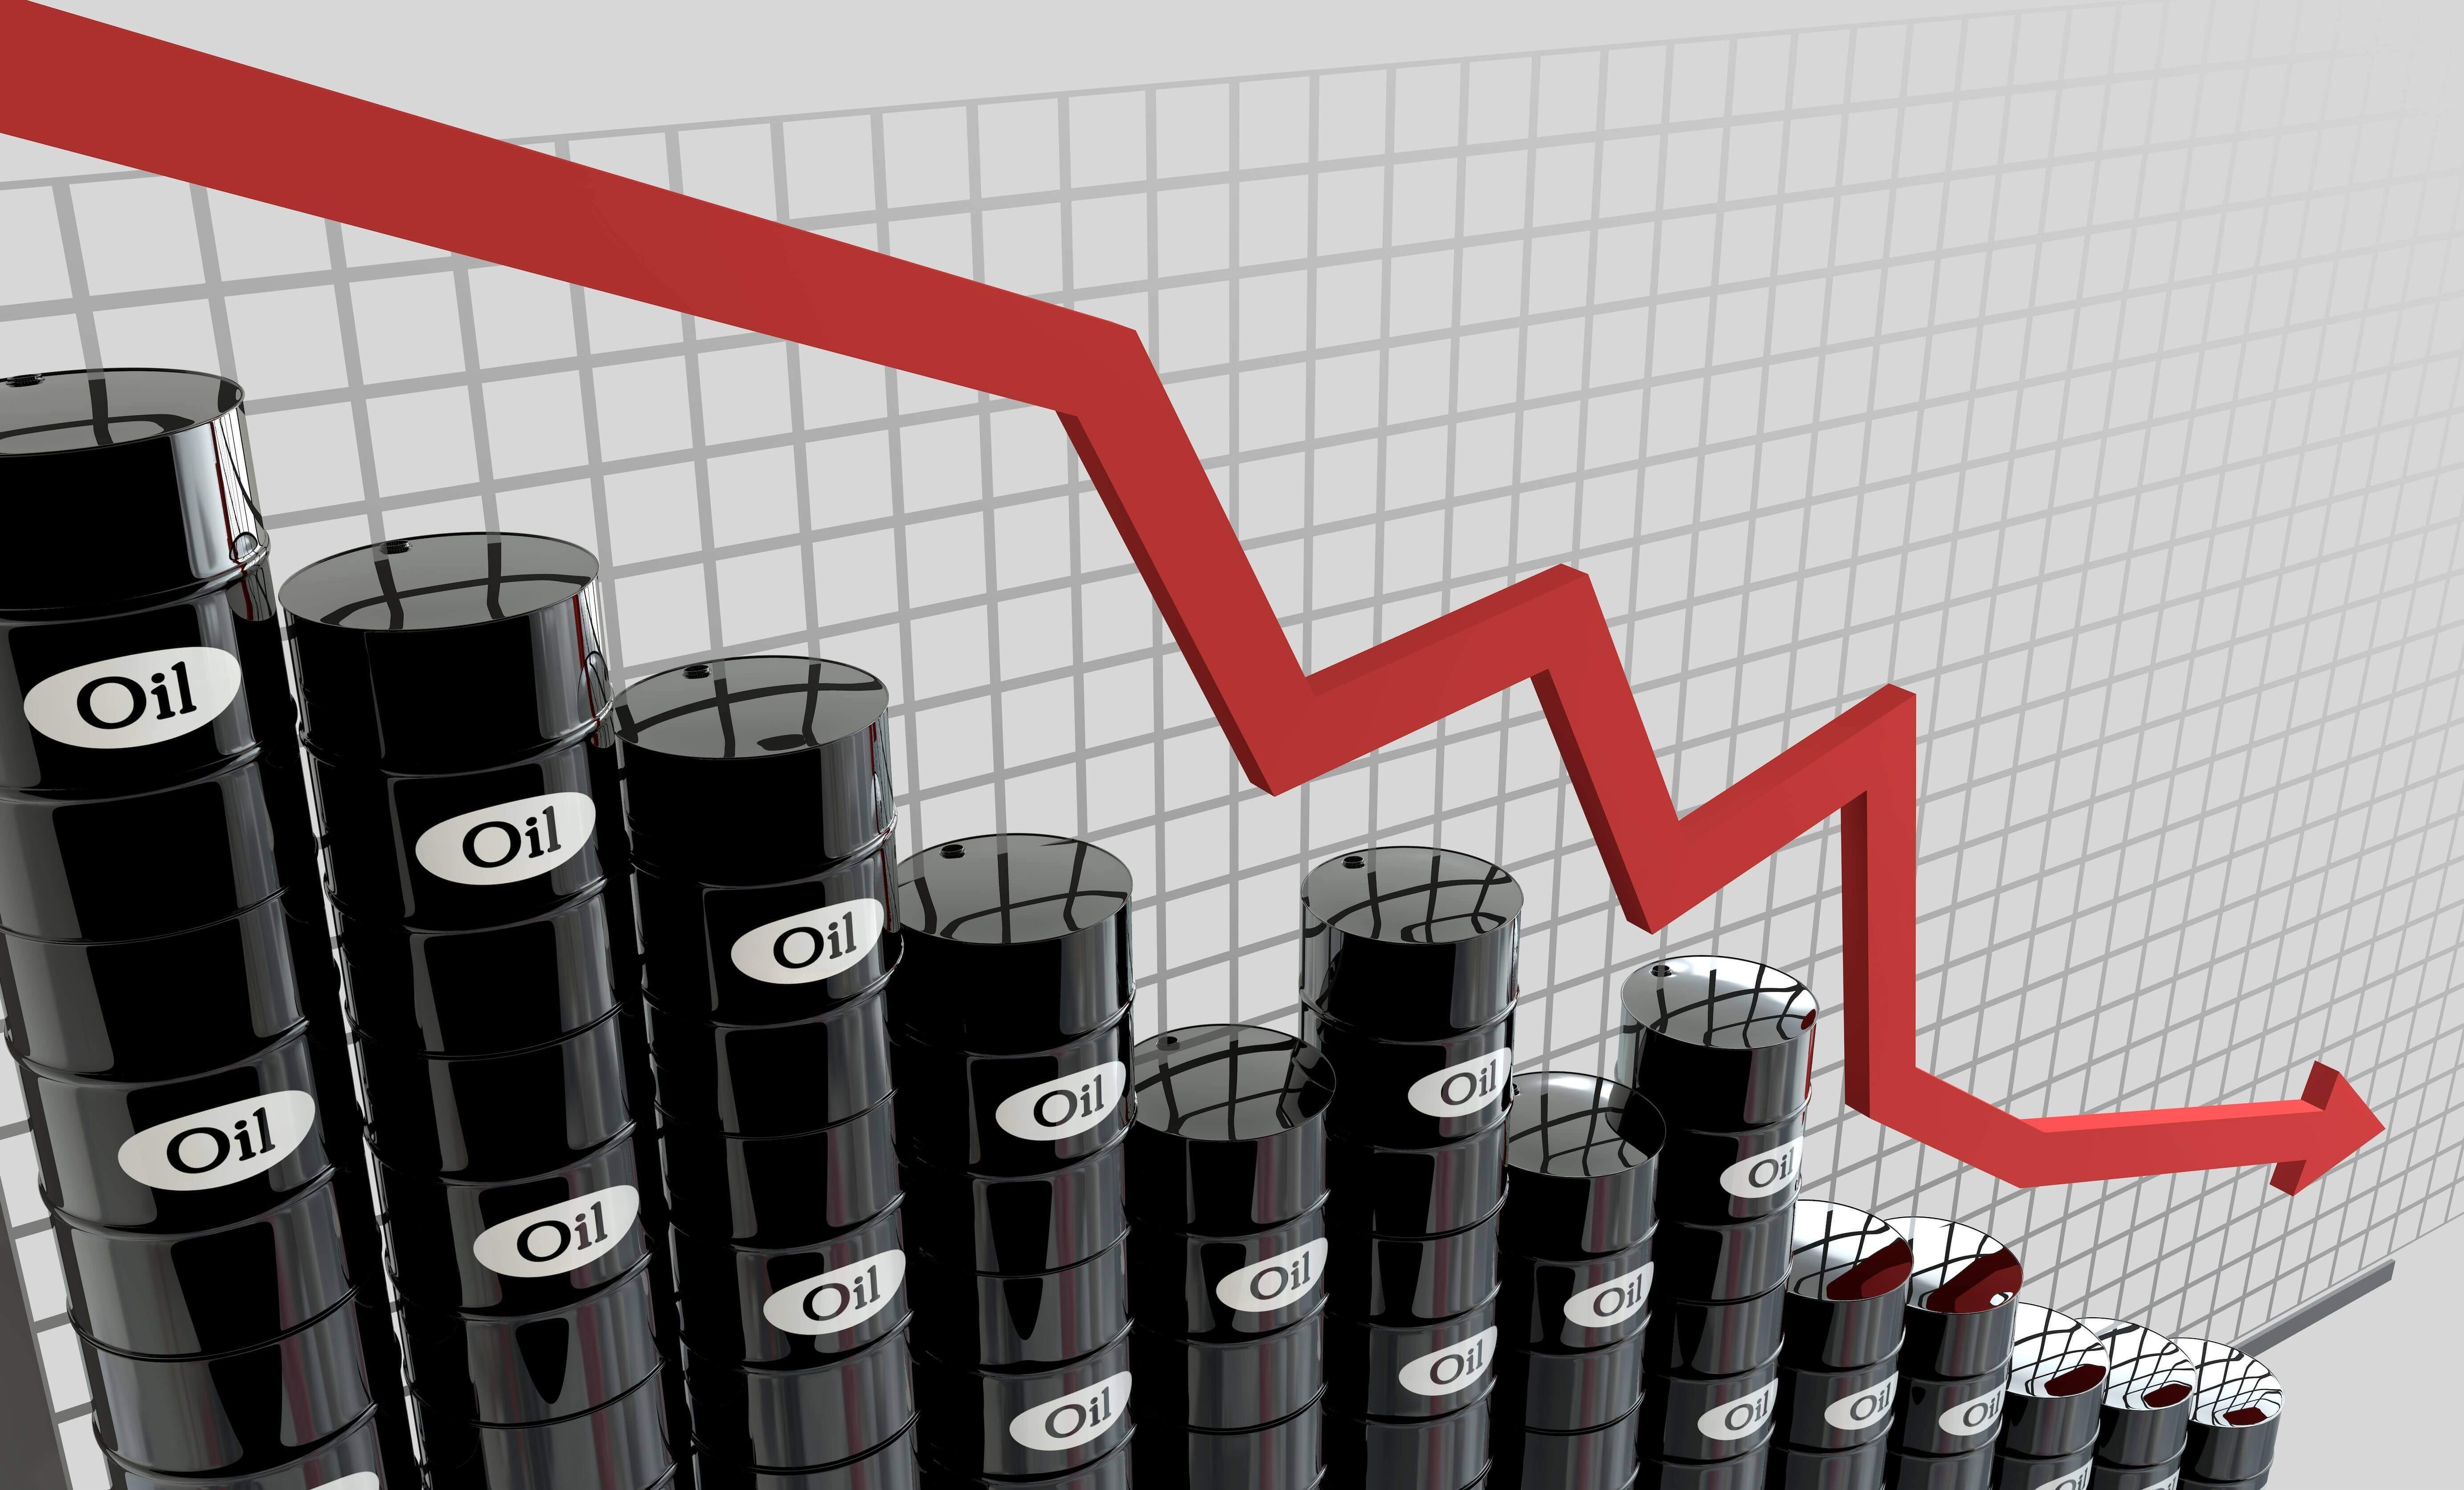 FinanceBrokerage - Commodity Market Oil prices decline on worsening US-China trade war